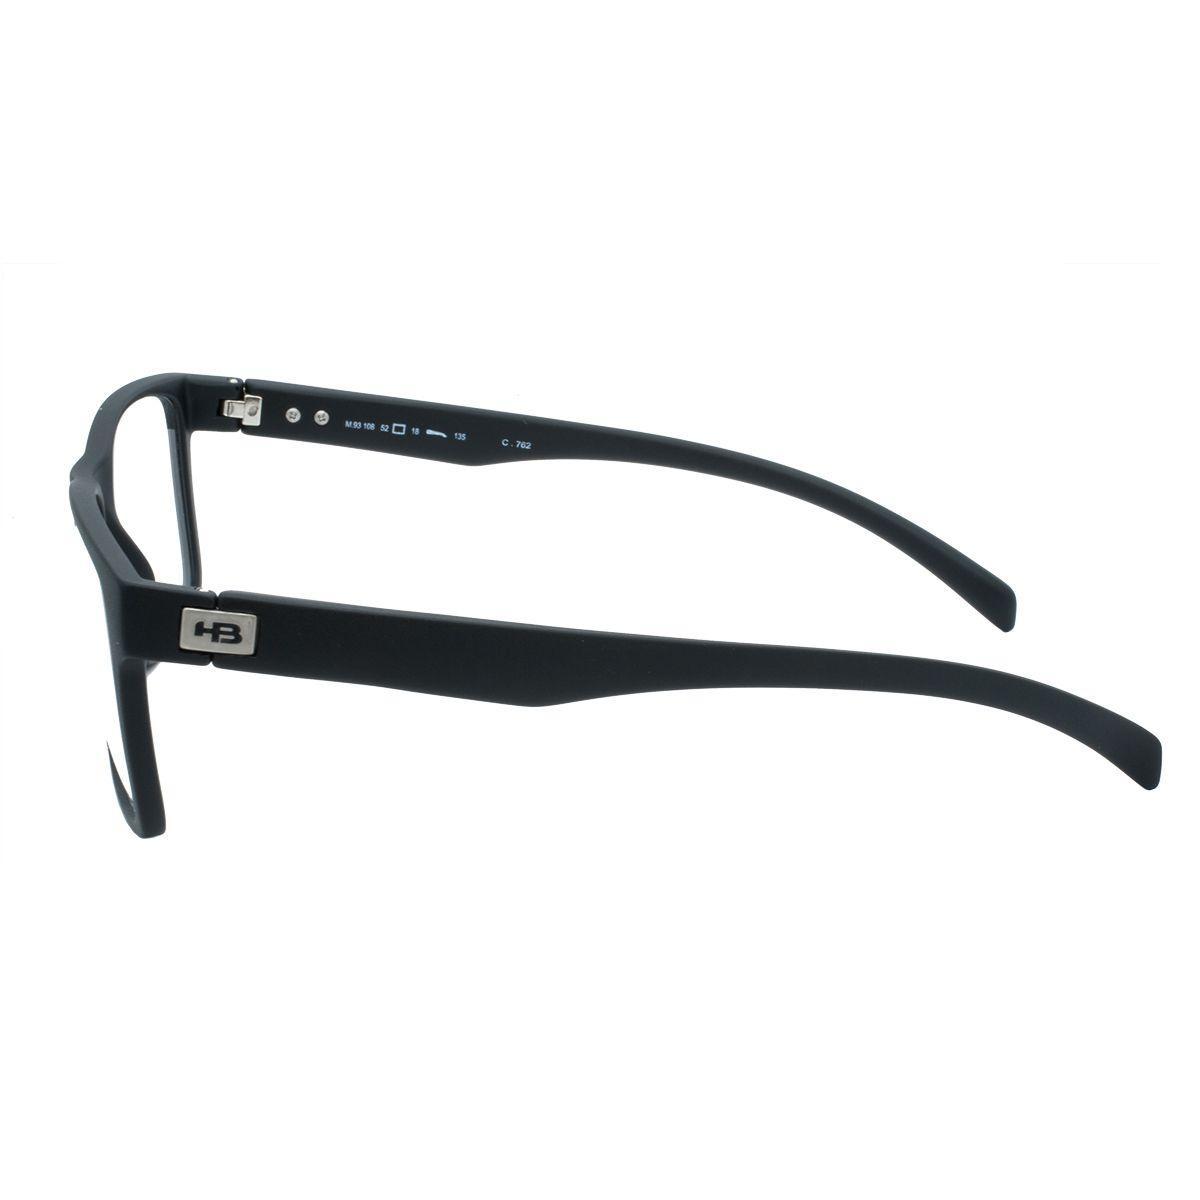 b1a2bbaf6a010 Óculos de Grau HB Masculino Acetato Polytech Preto - M.93108 C762 - Hb -  hot butterd R  281,00 à vista. Adicionar à sacola